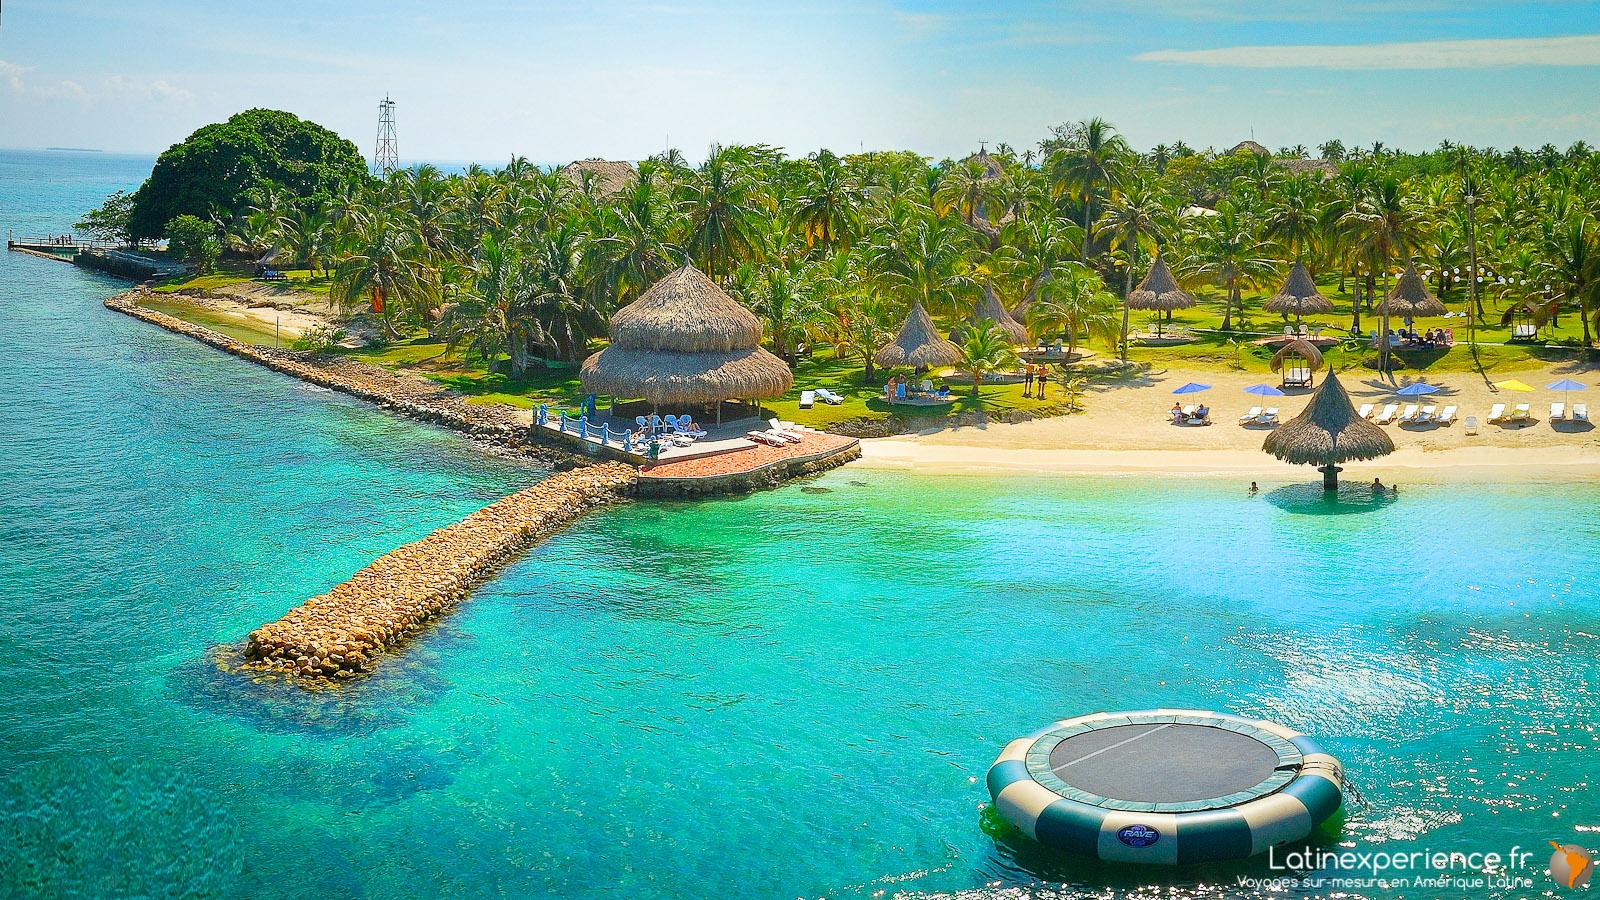 Colombie - île de Mucura - Voyage de noël